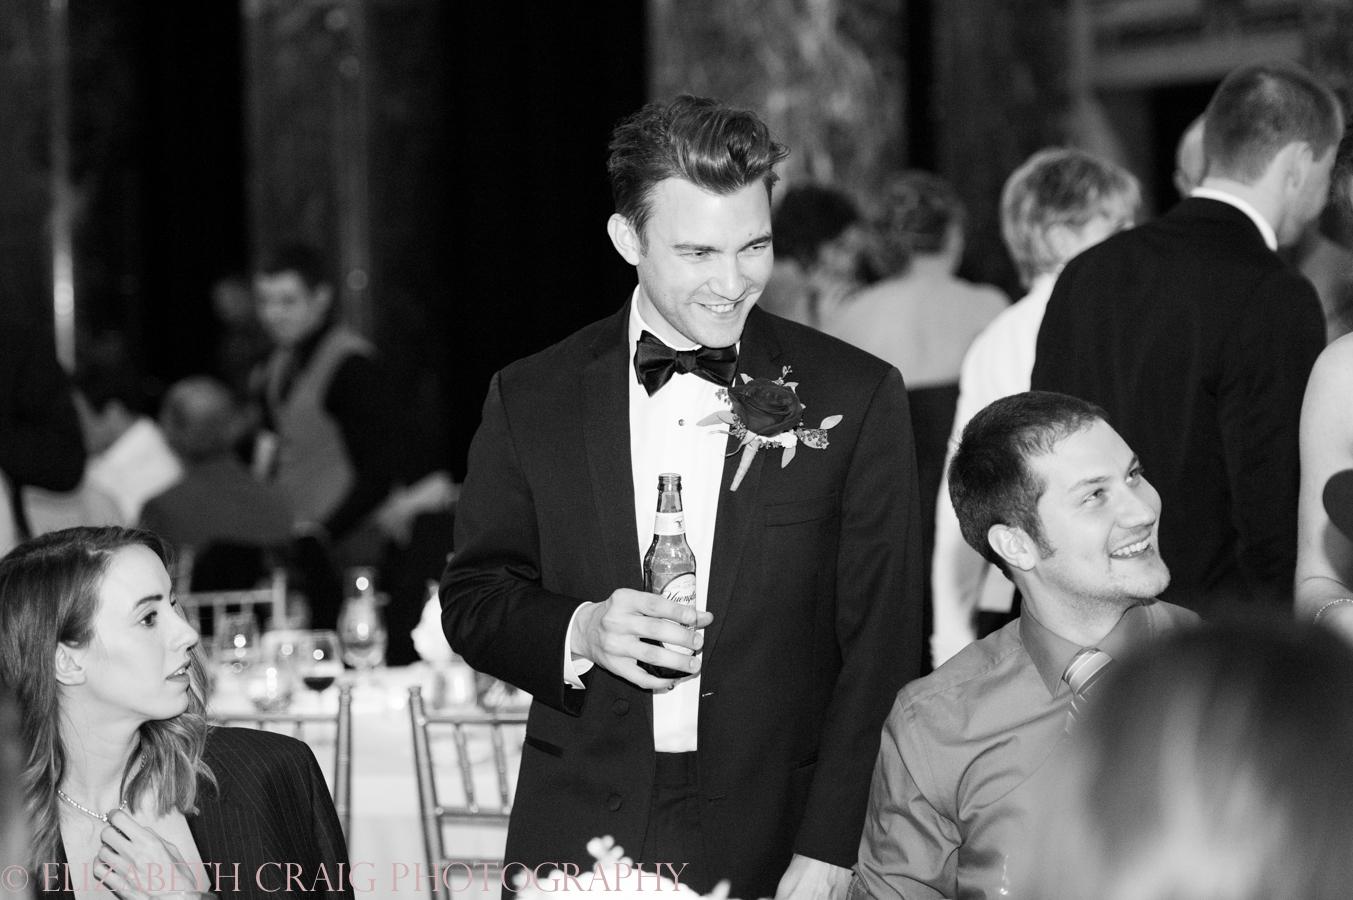 Carnegie Museum of Art Weddings | Elizabeth Craig Photography-0128